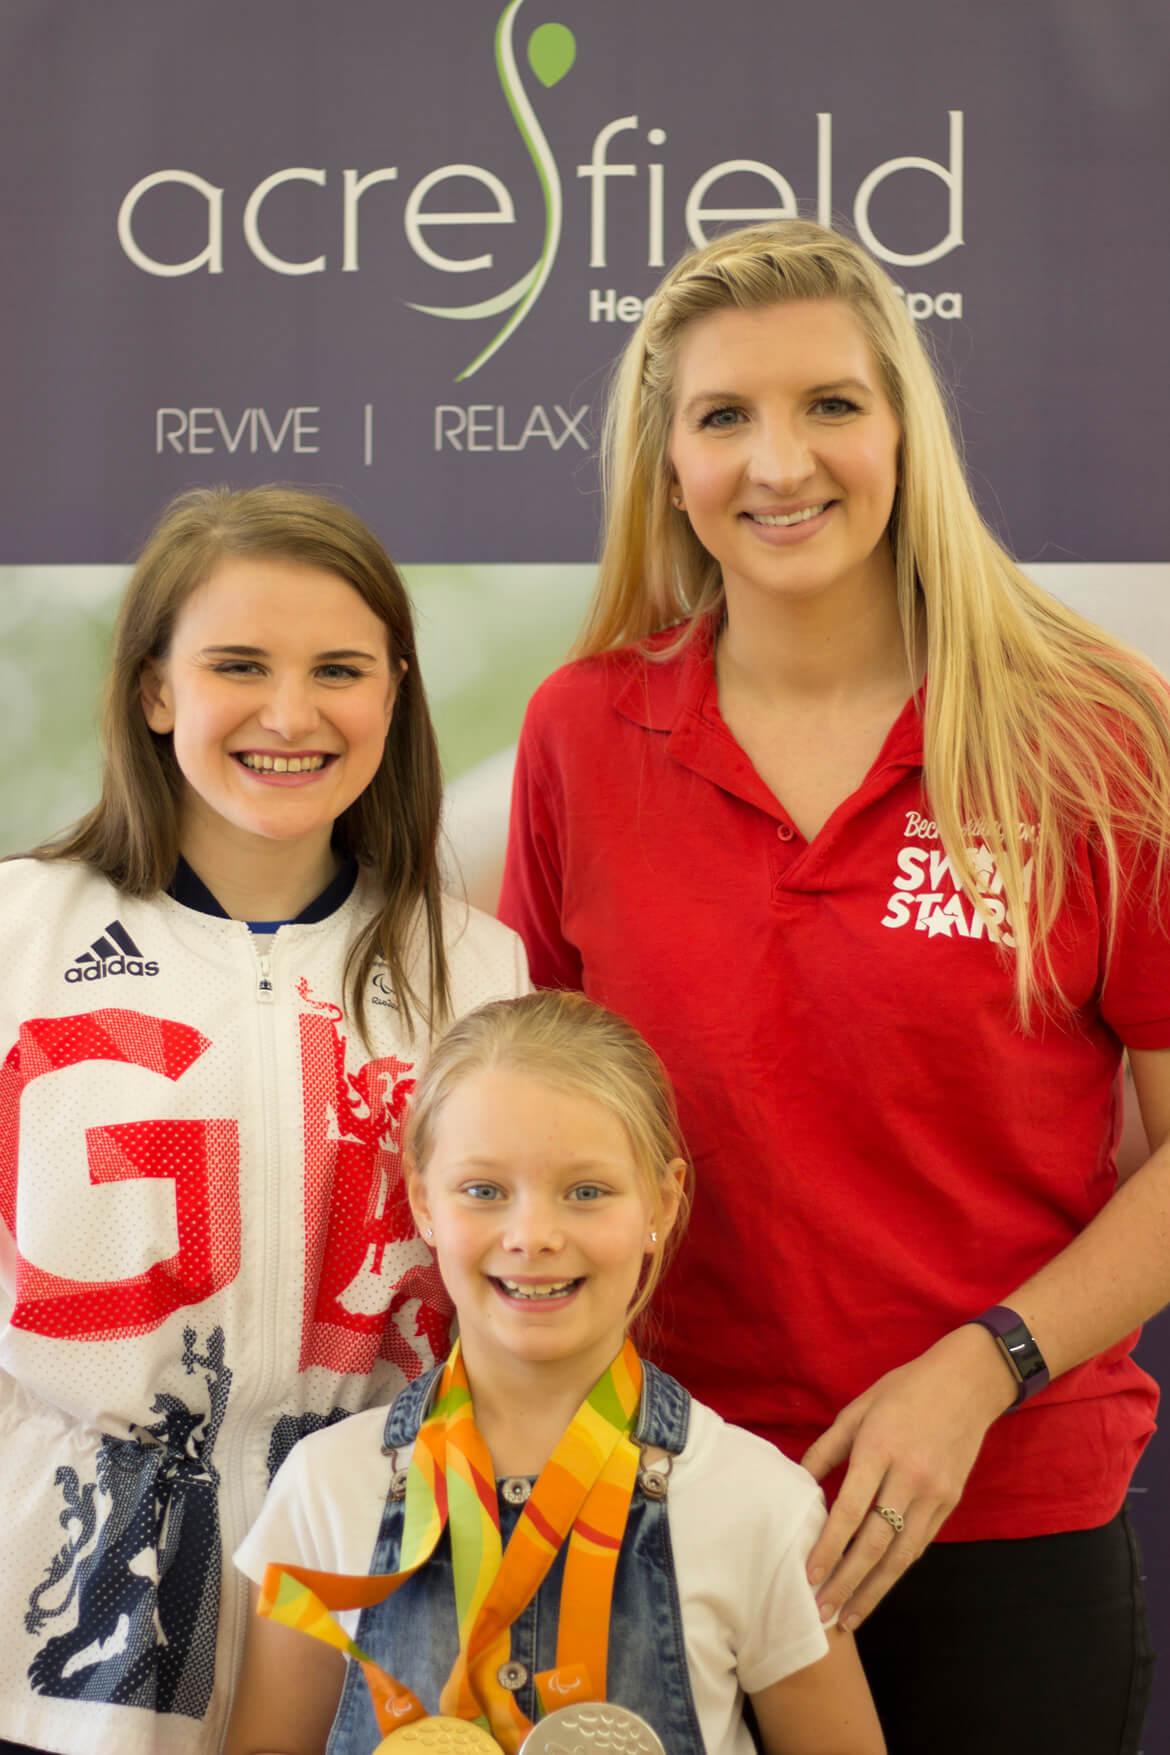 Olympic medalist Rebecca